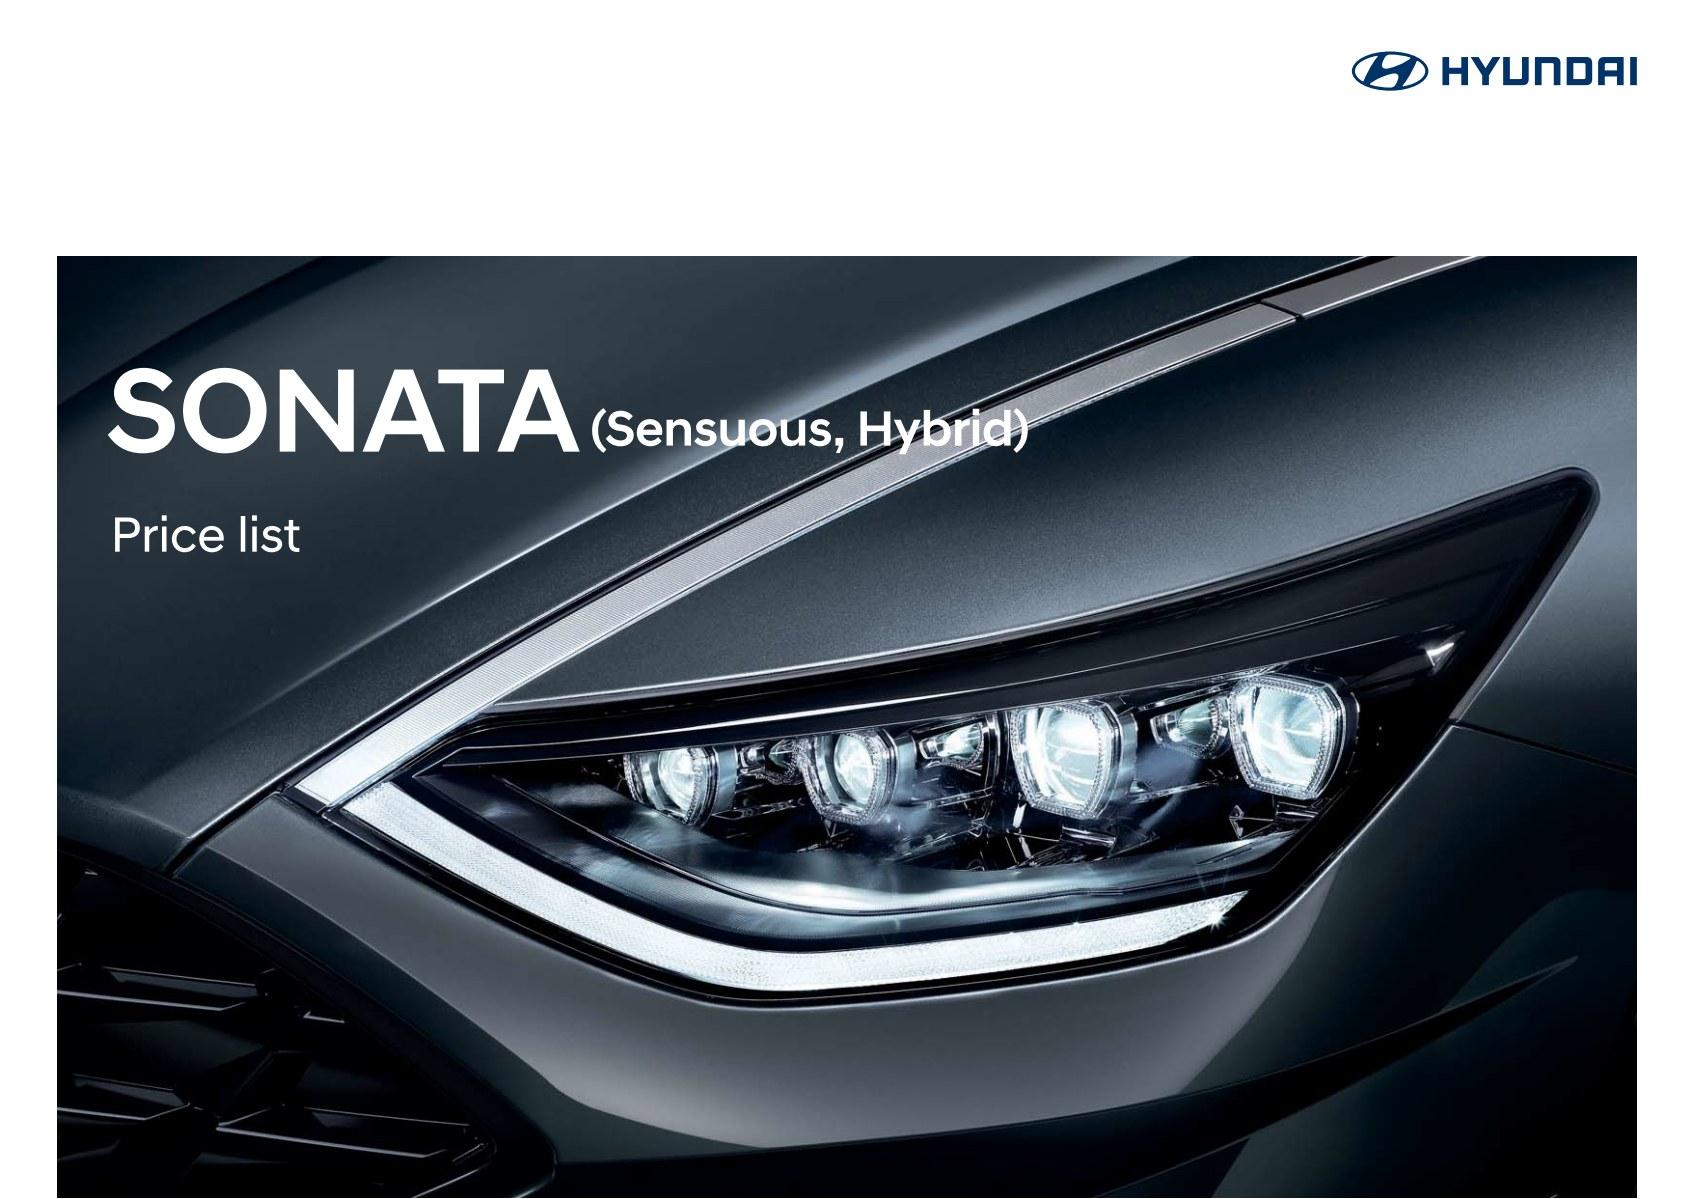 sonata-price_01.jpg